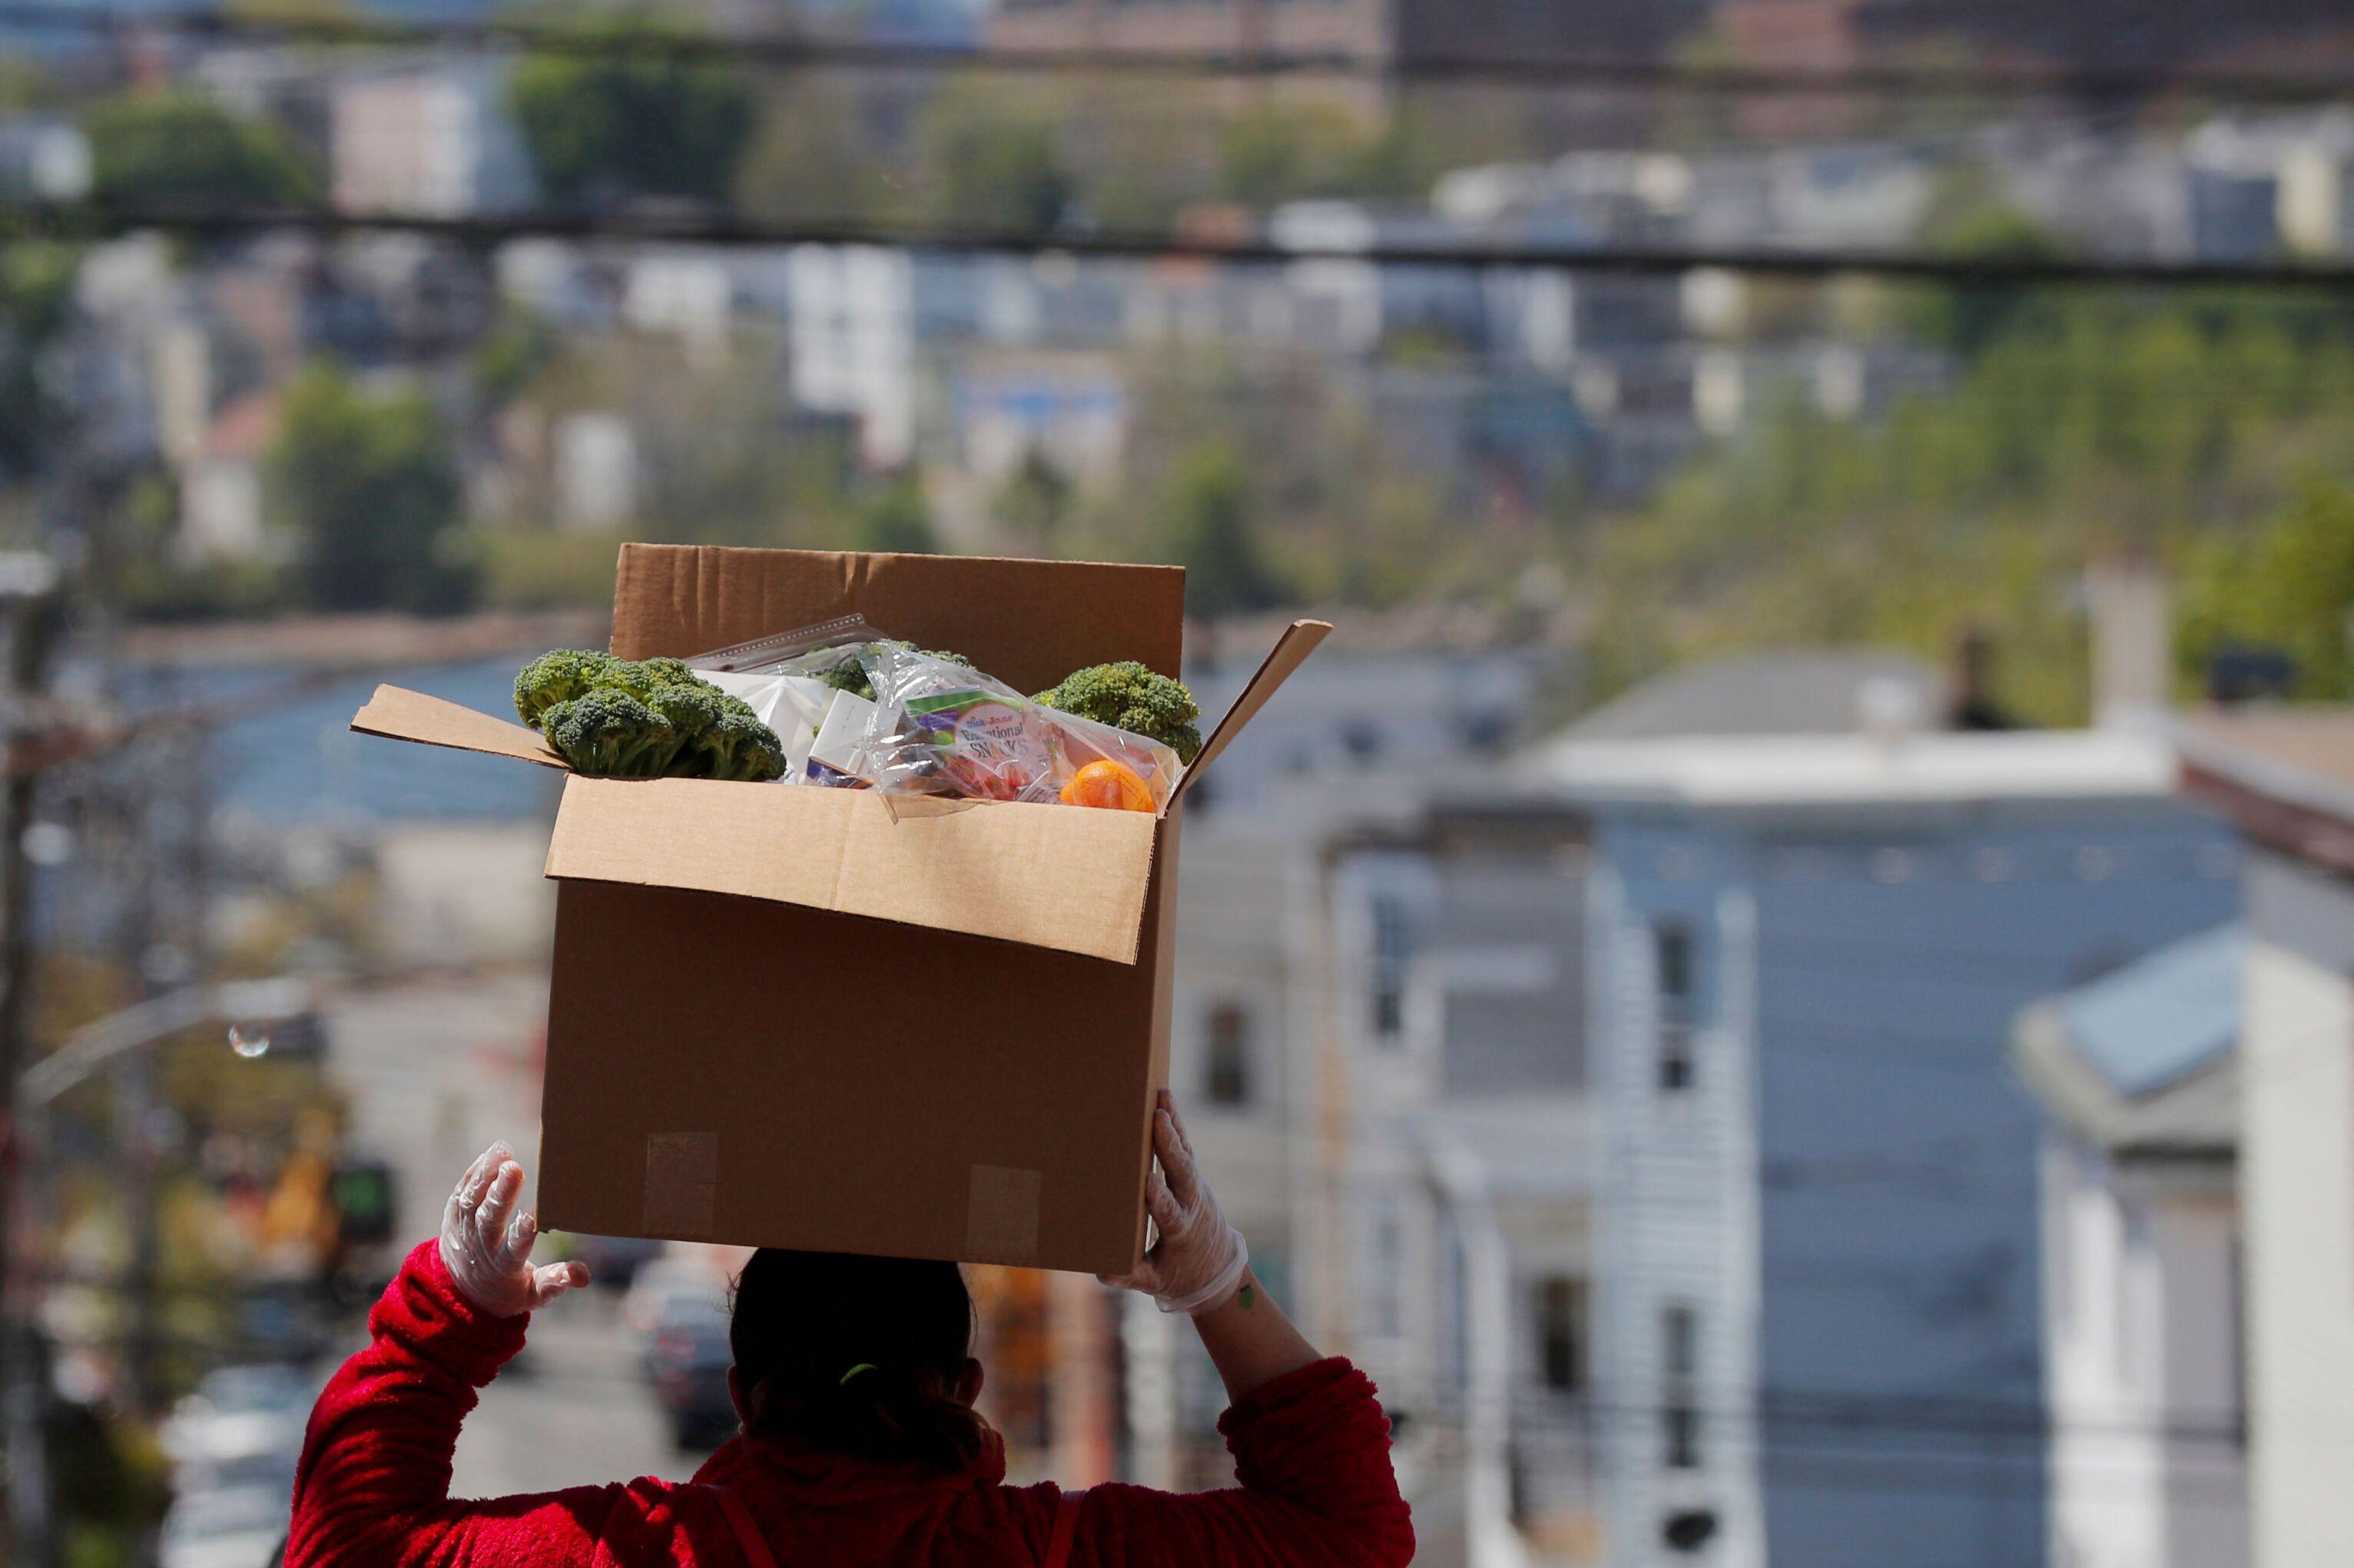 Moradora da cidade de Chelsea leva comida para casa, no estado de Massachusetts, EUA, 19 de maio de 2020